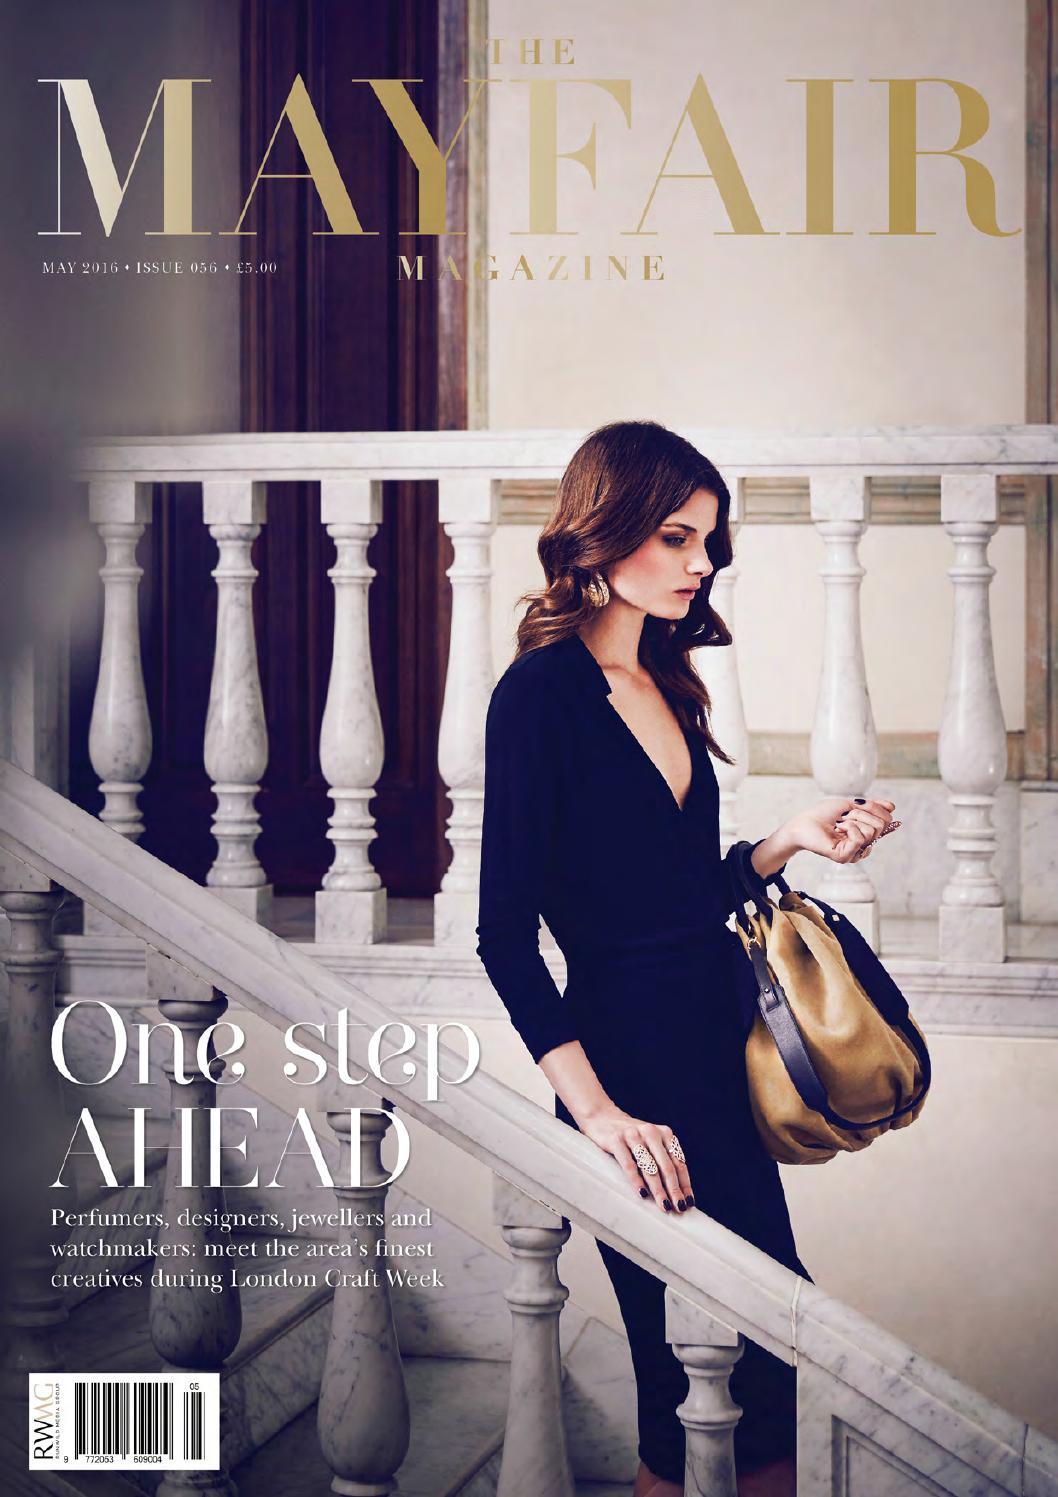 The Mayfair Magazine May 2016 by Runwild Media Group - Issuu